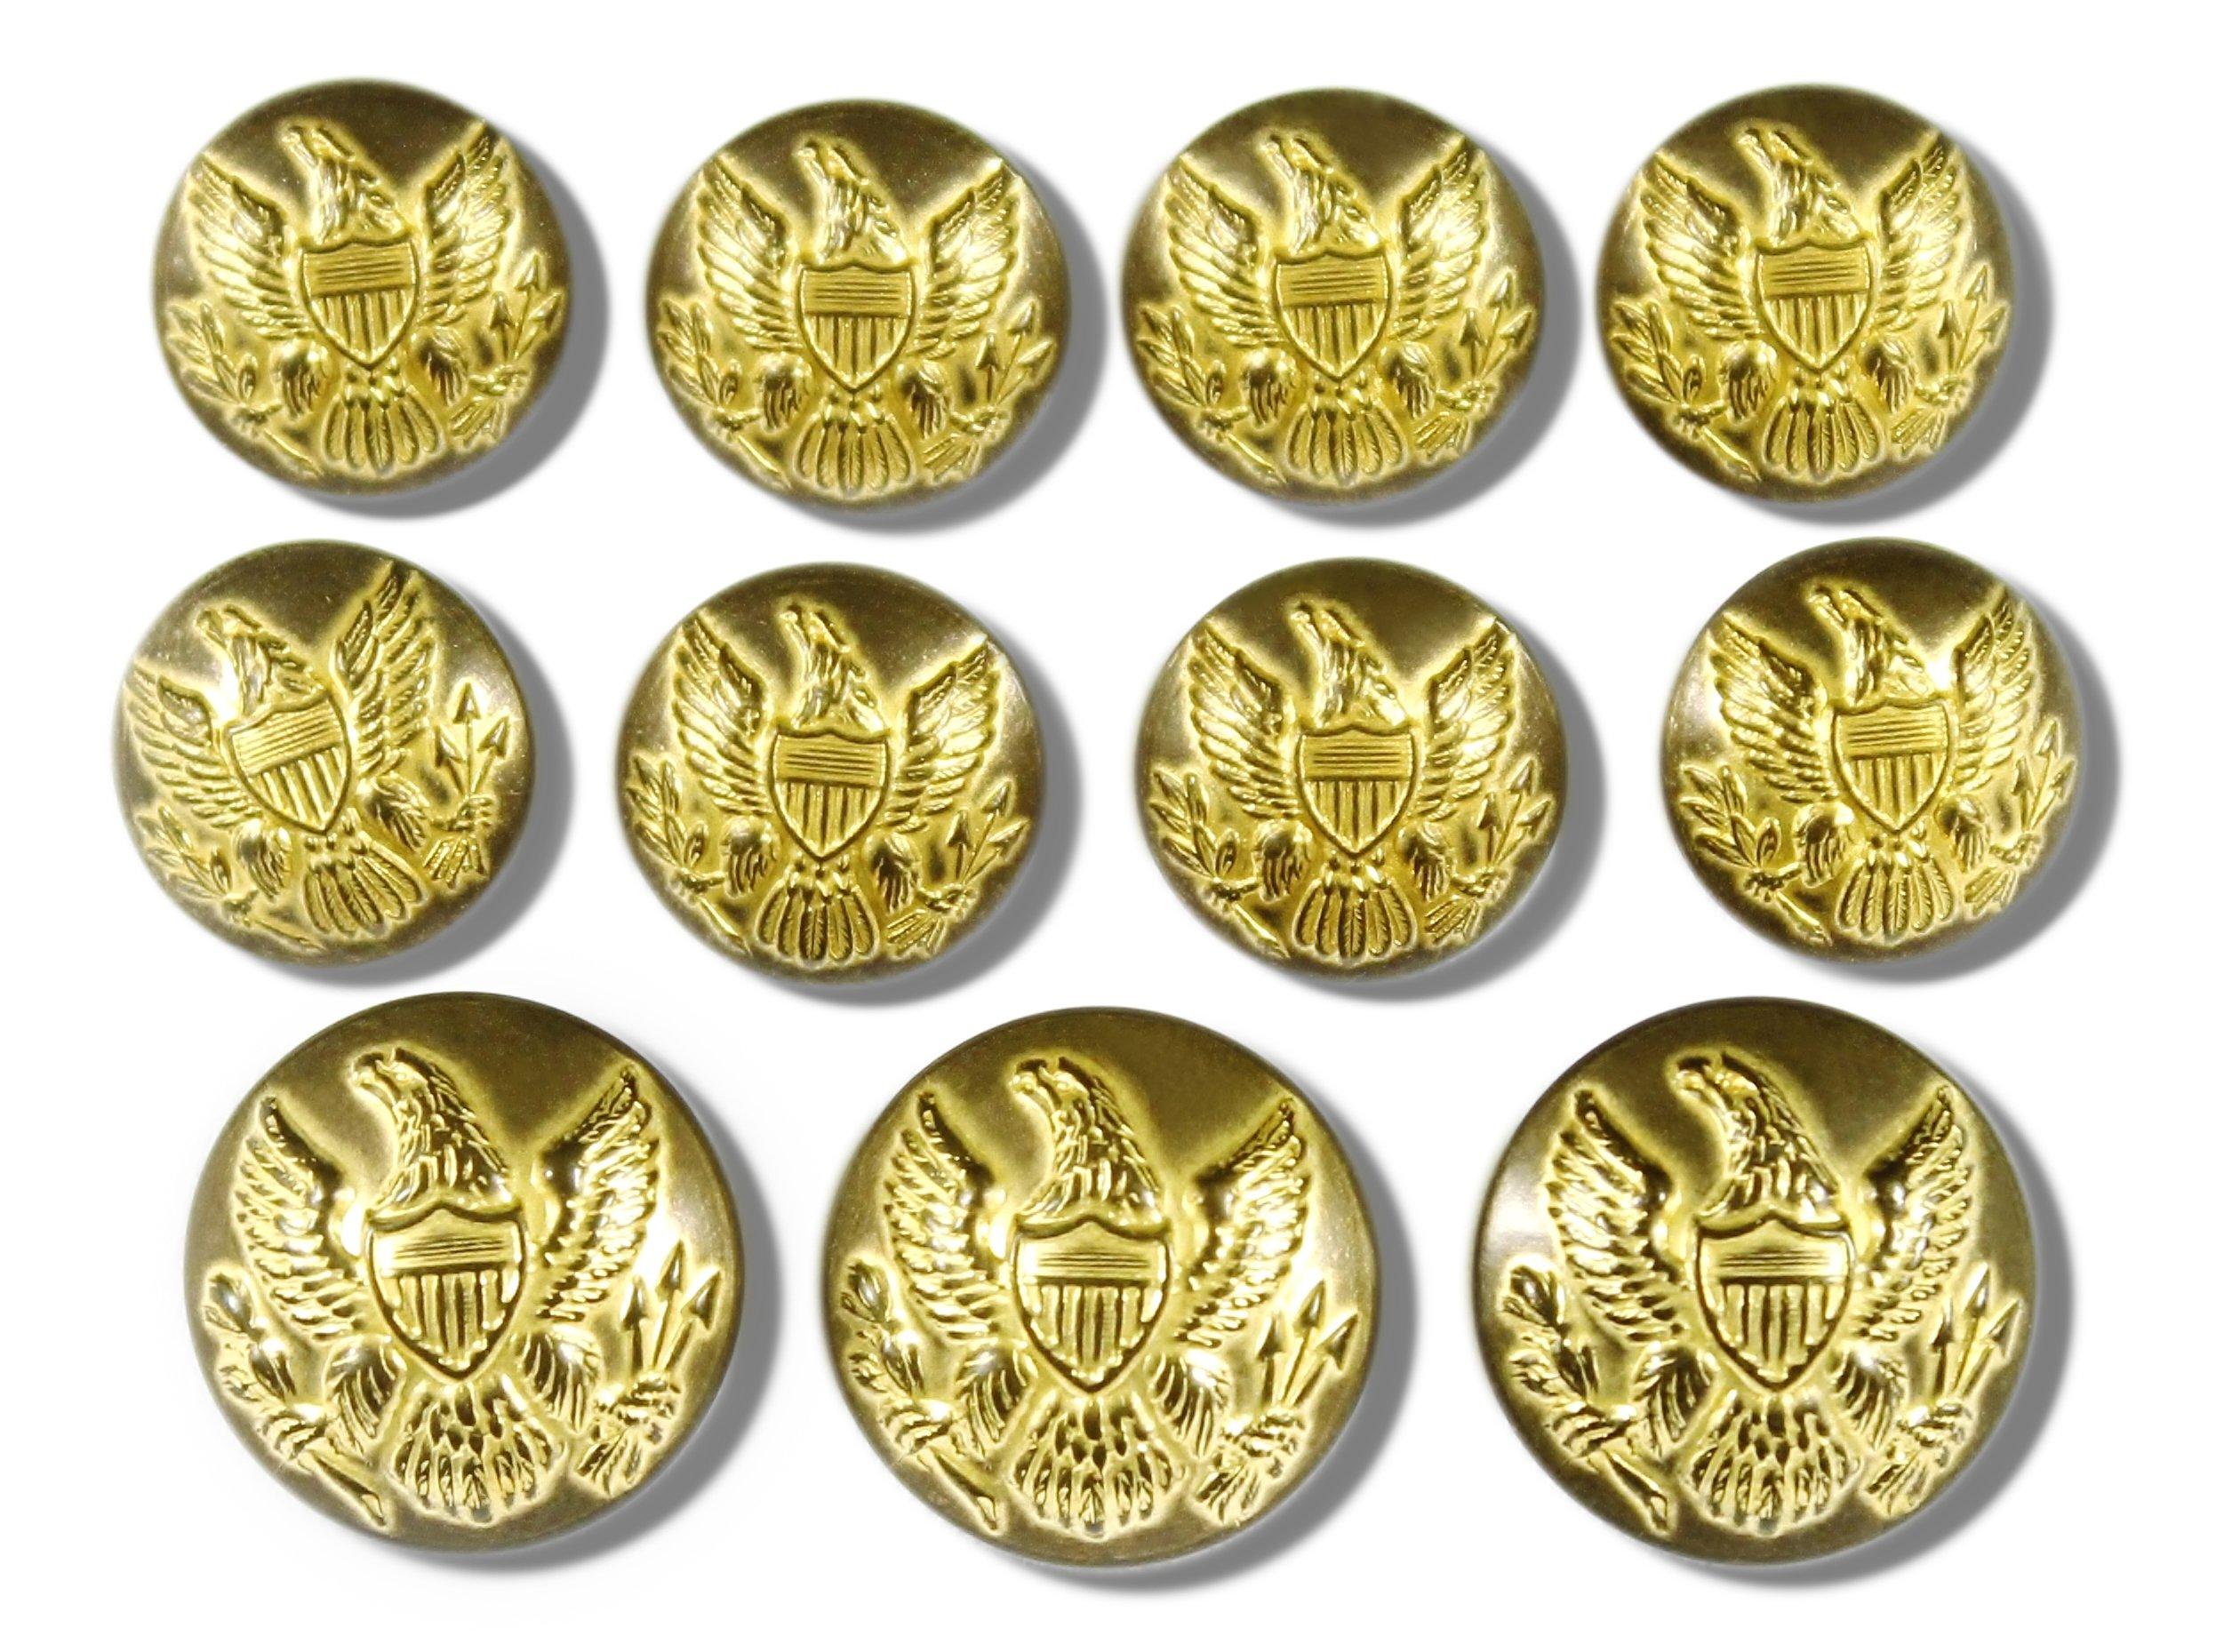 Premium WATERBURY Metal ~Vintage Gold 11-Piece Single Breasted~ American Civil WAR ~Union Army Eagle Emblem~ Uniform Sport Coat Jacket Shank Style Blazer Button Set ~ MetalBlazerButtons.com by Waterbury